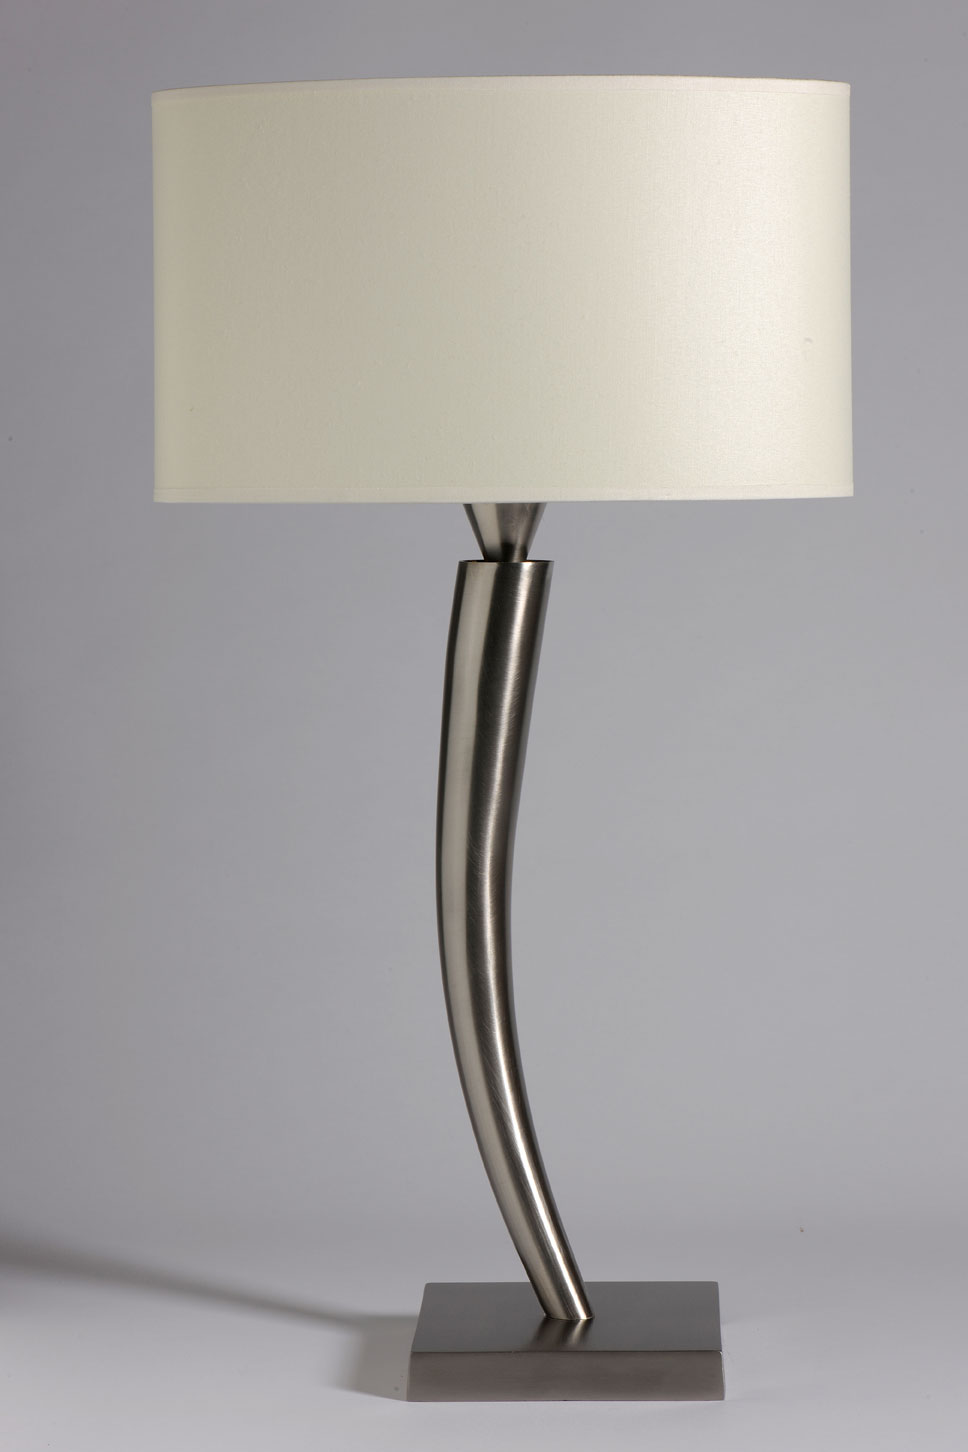 Lampe Chevet Design Contemporain Le Monde De Lea